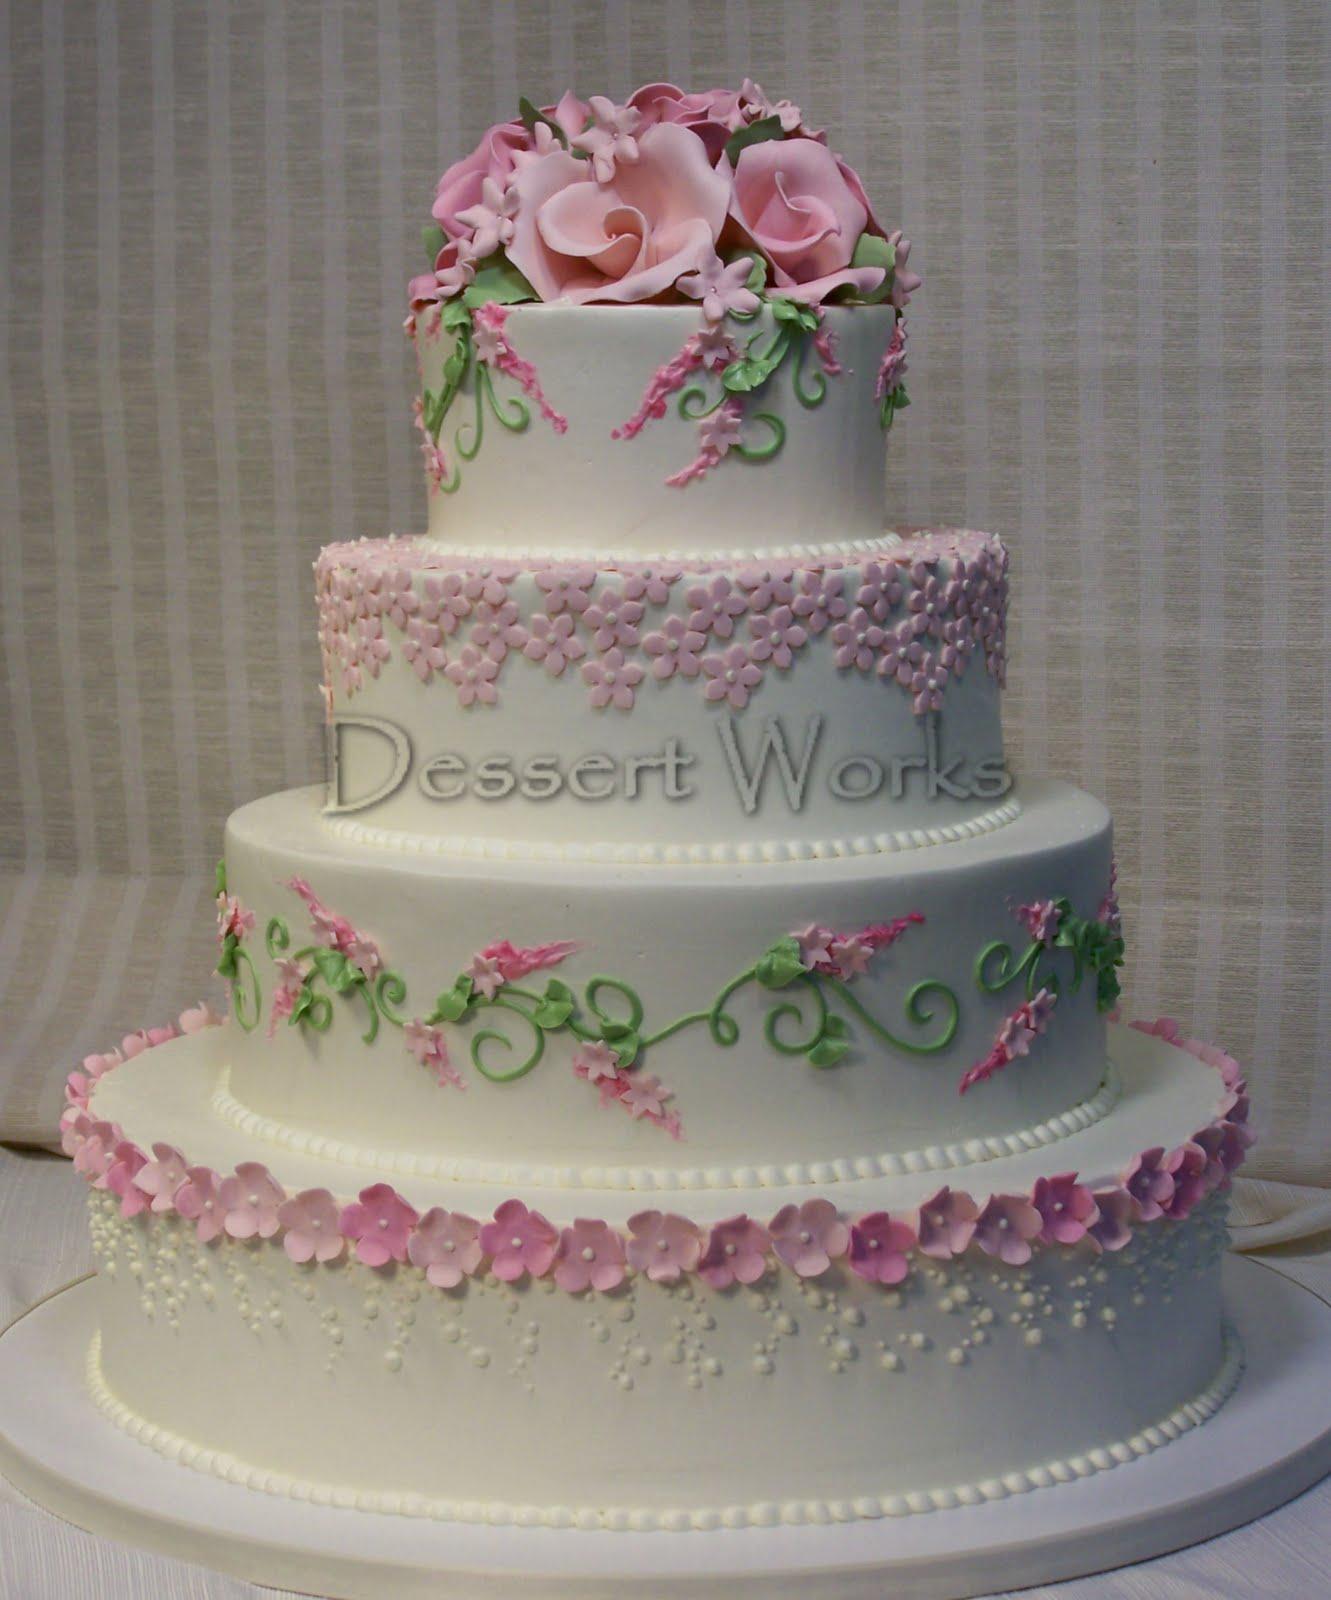 Dessert Works Bakery: April 2010